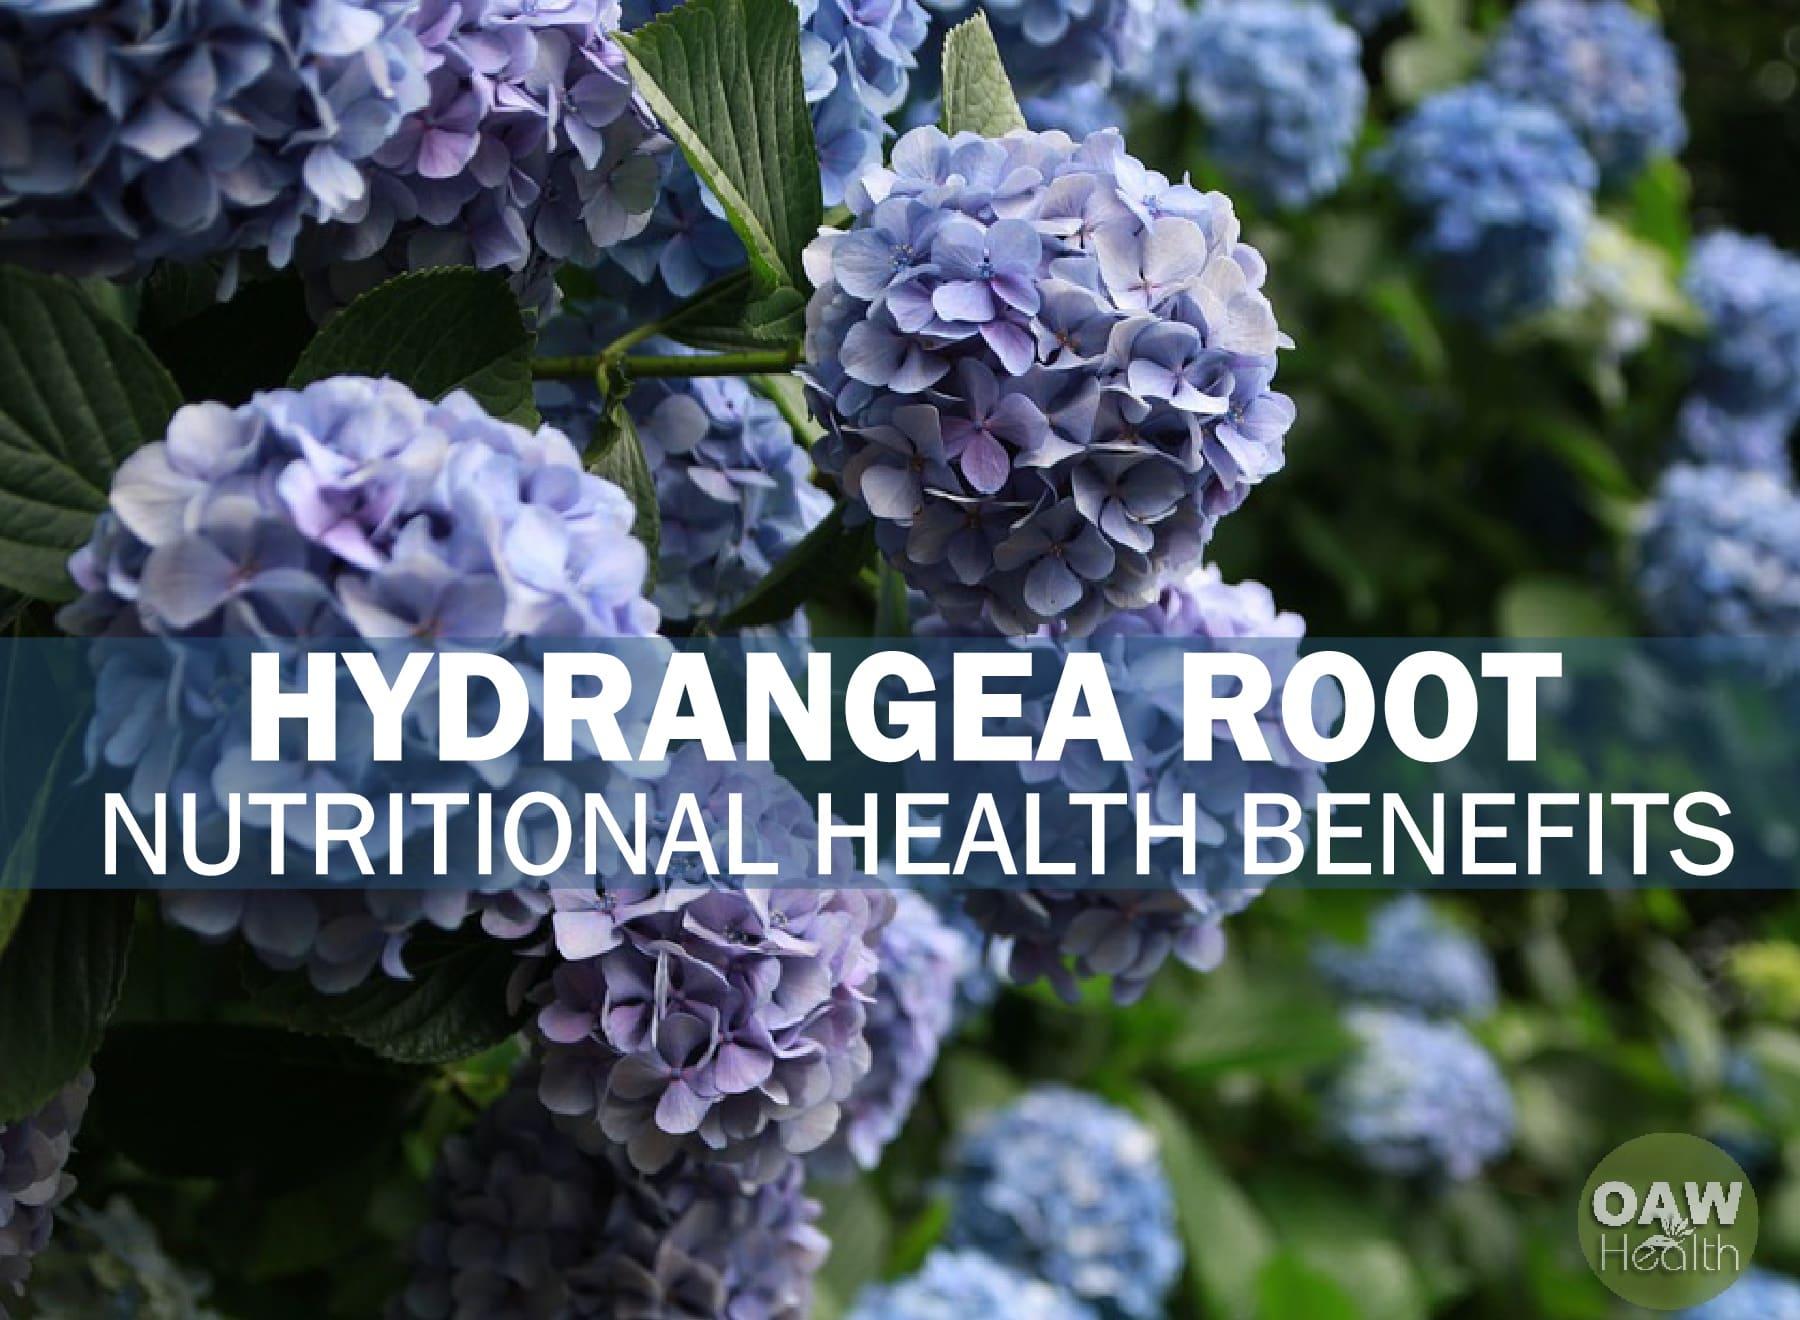 Hydrangea Root: Nutritional Health Benefits